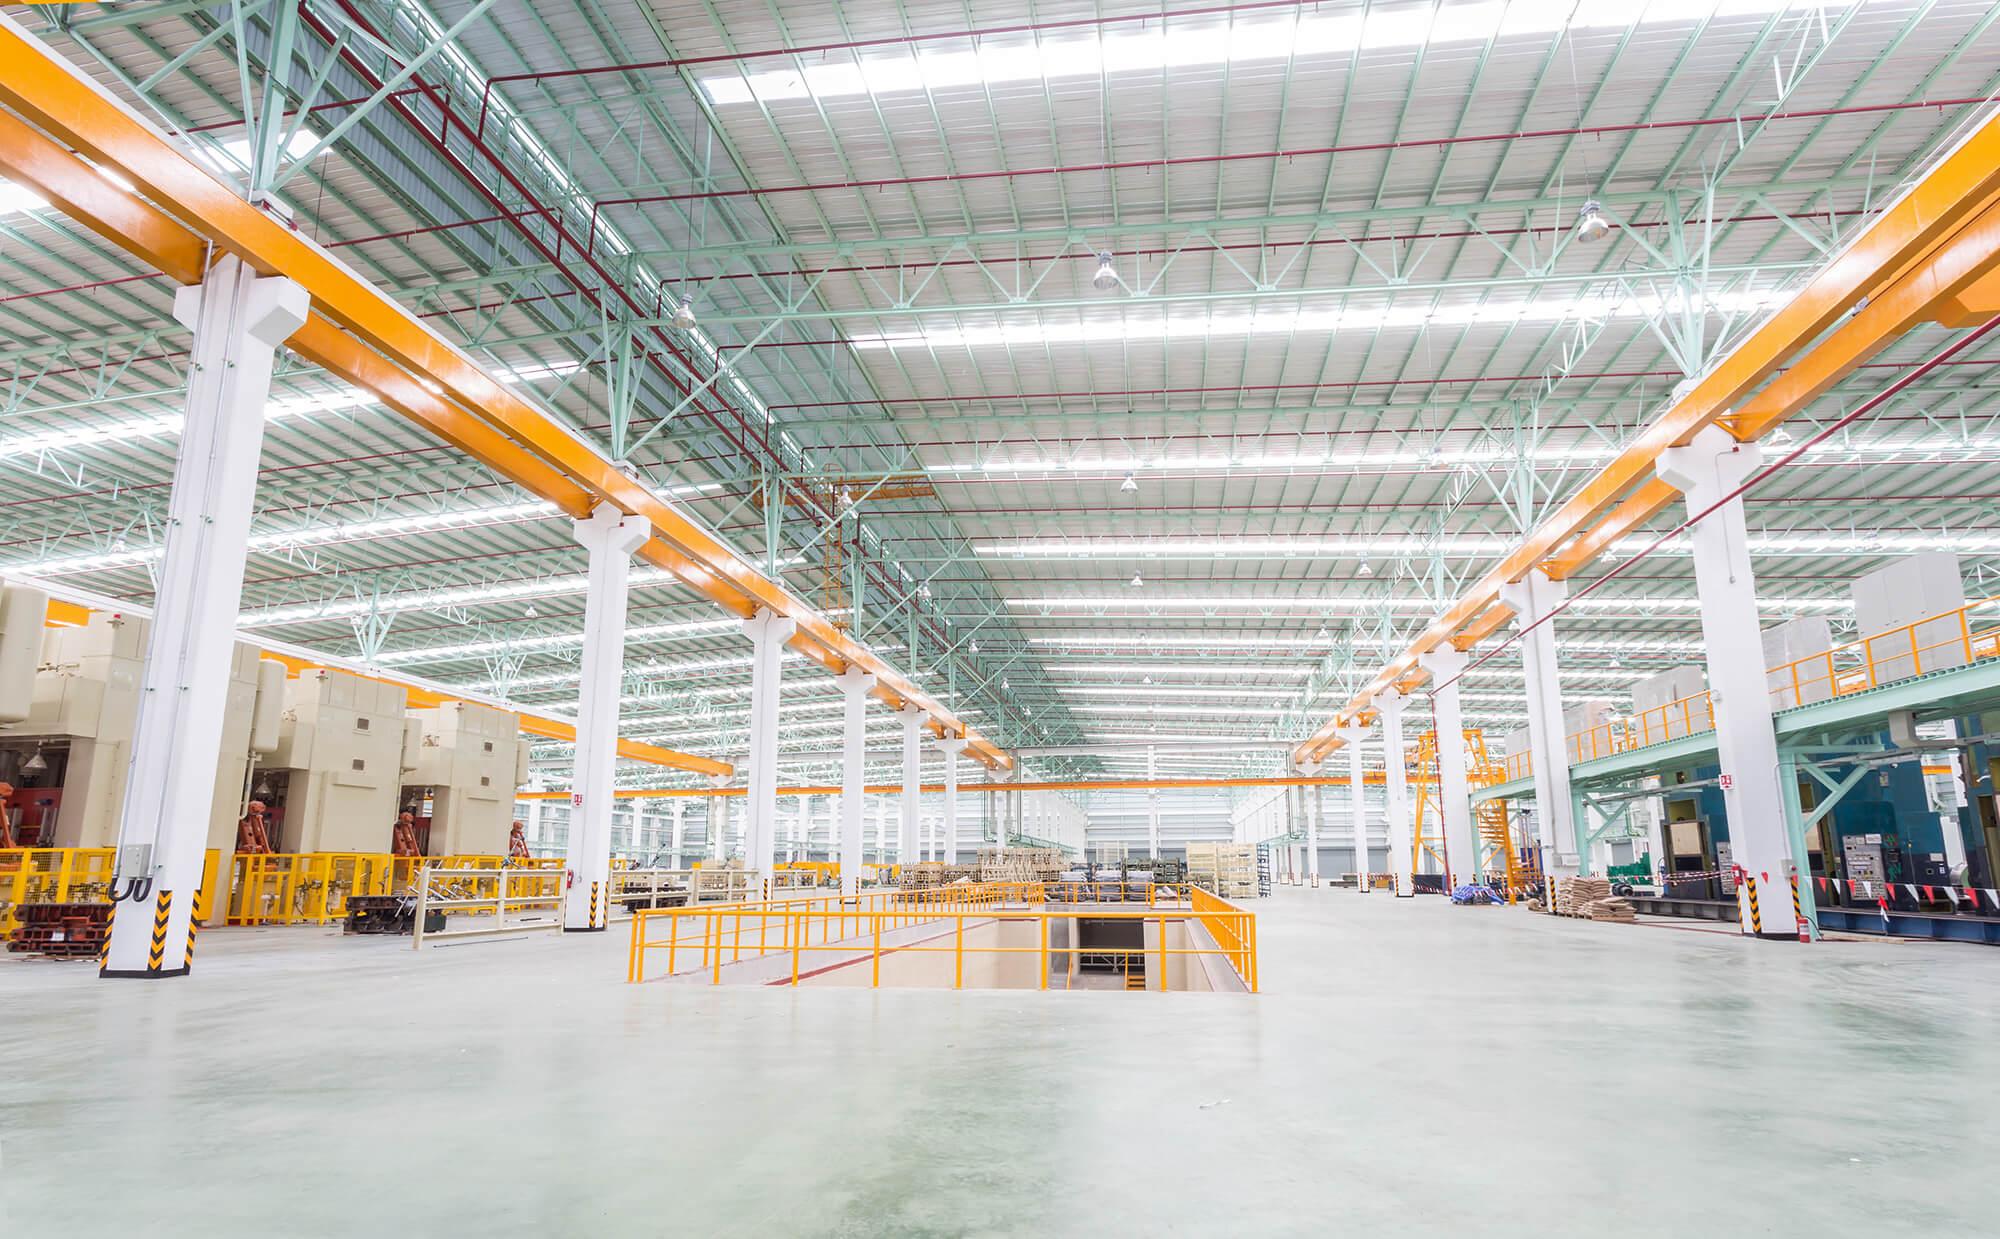 brightly lit warehouse LEDs